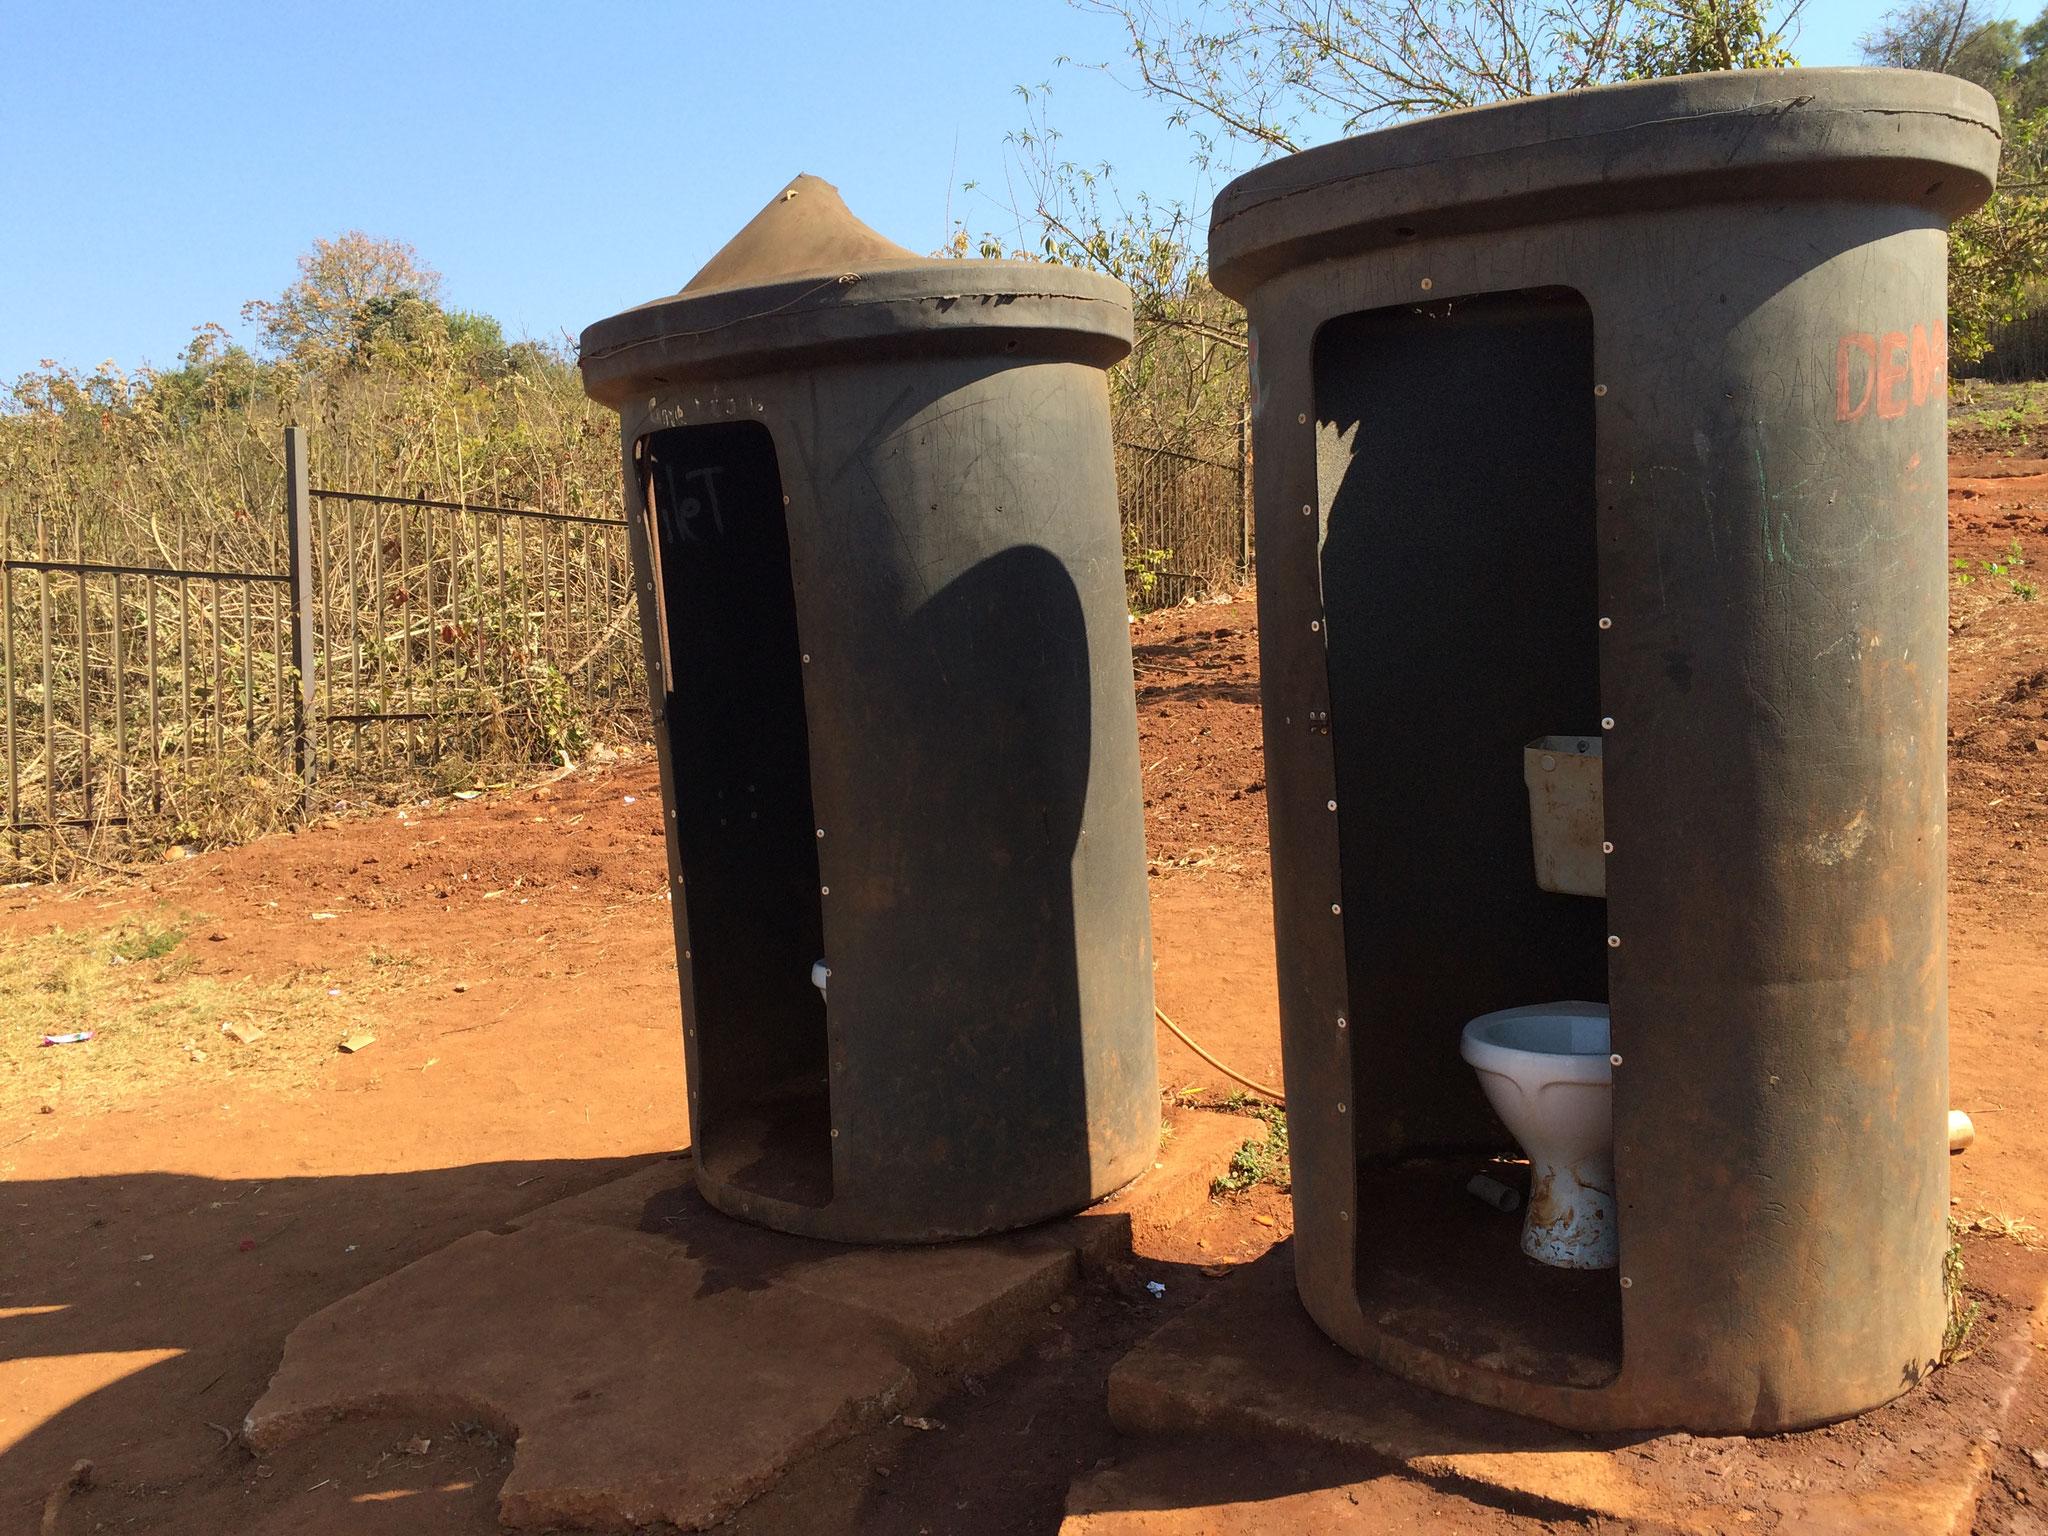 alte Toiletten